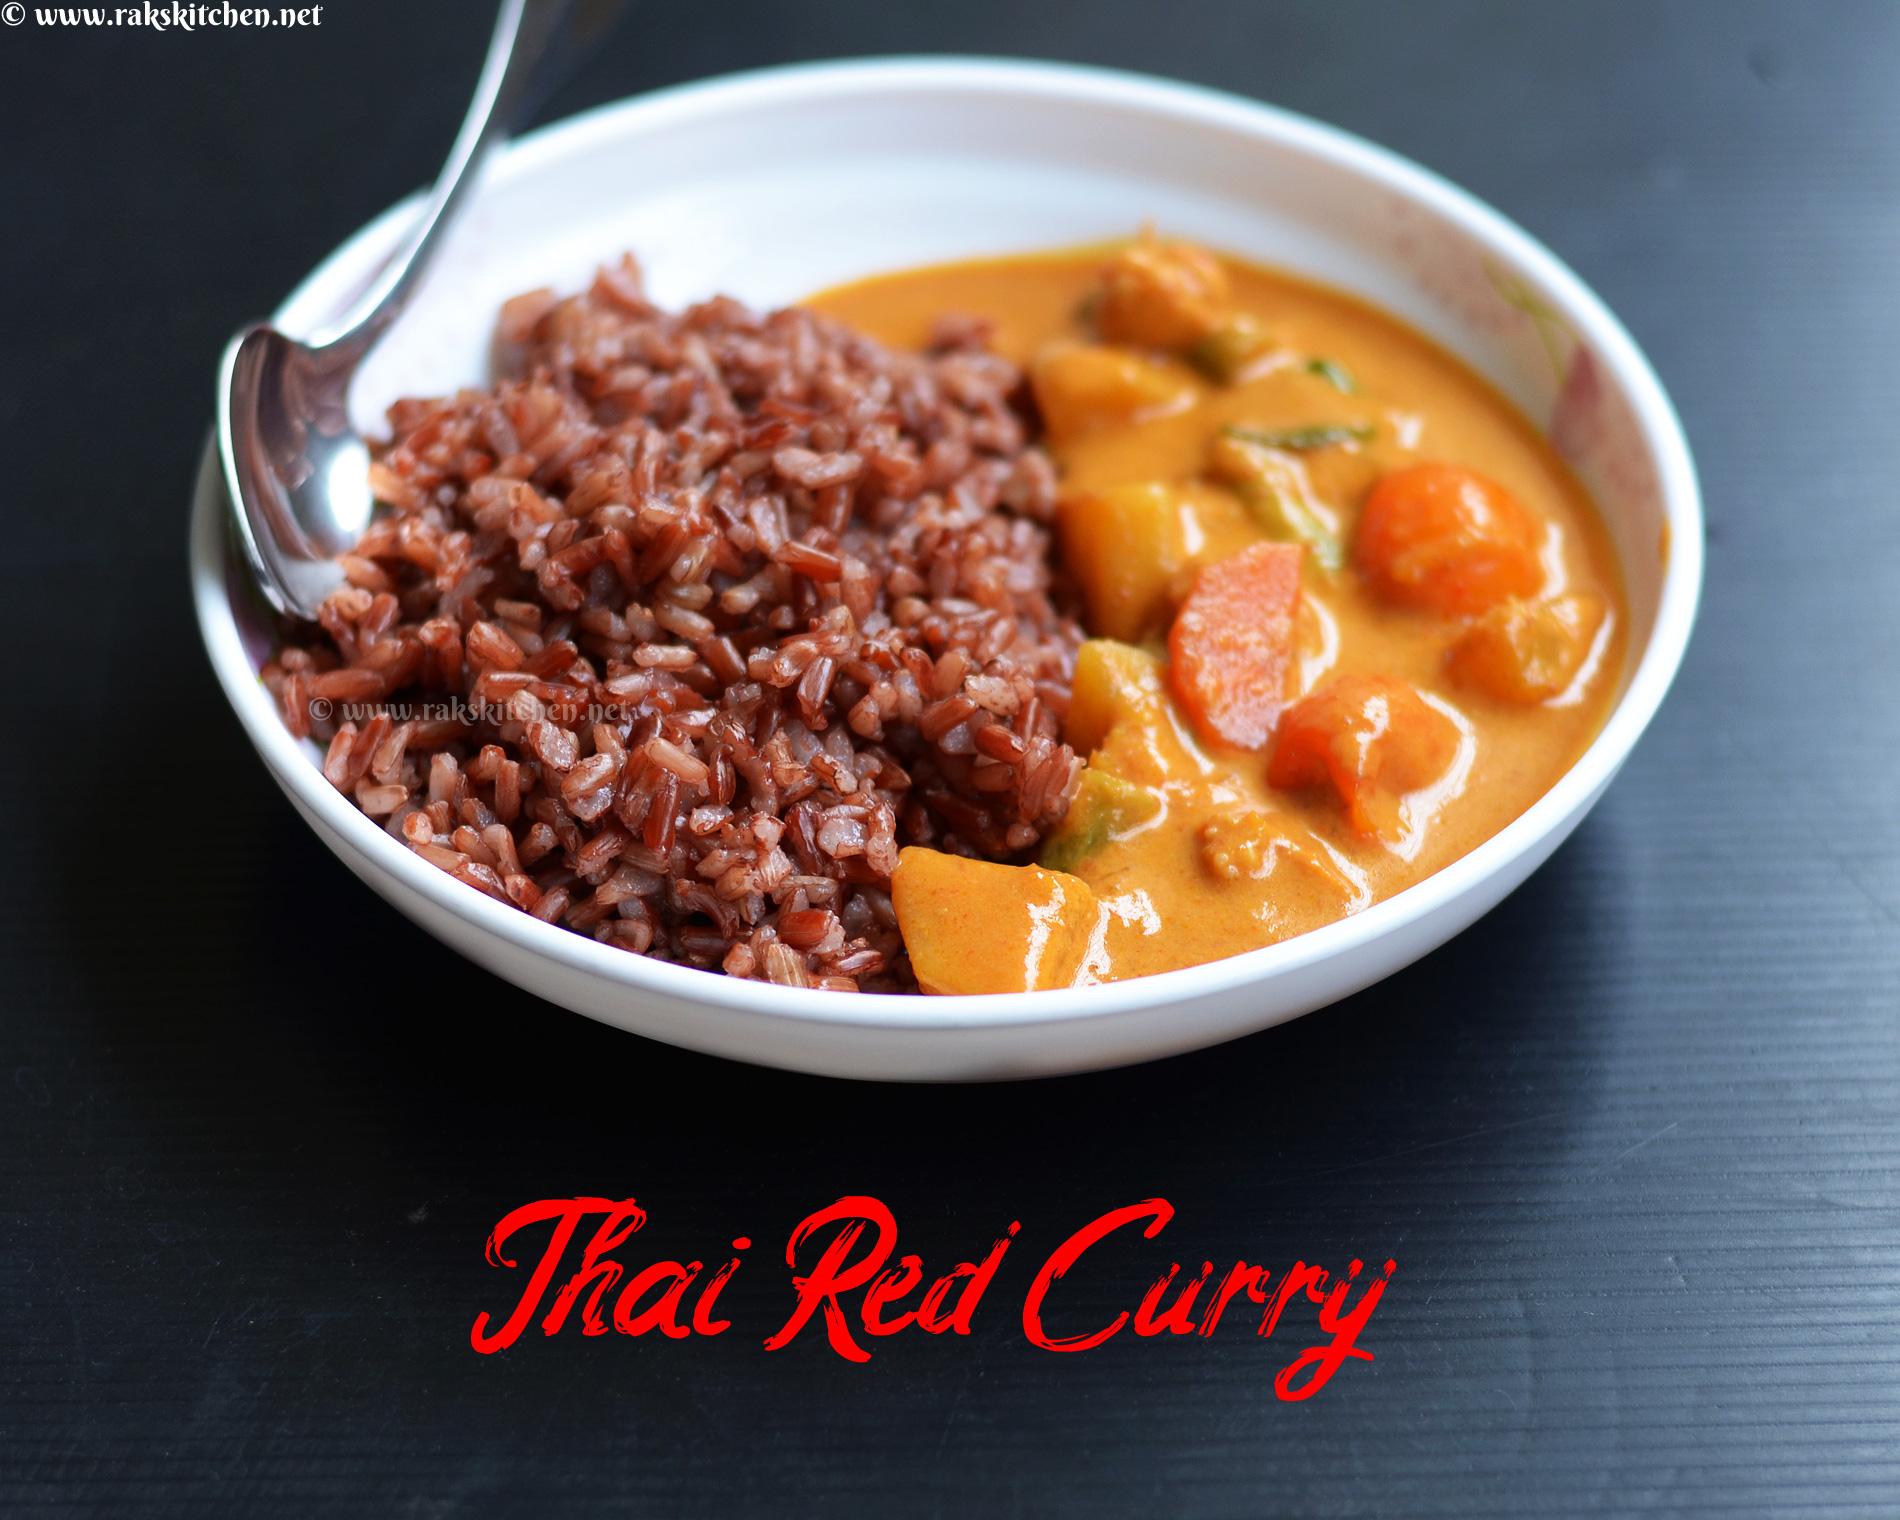 vegan-red-curry-recipe